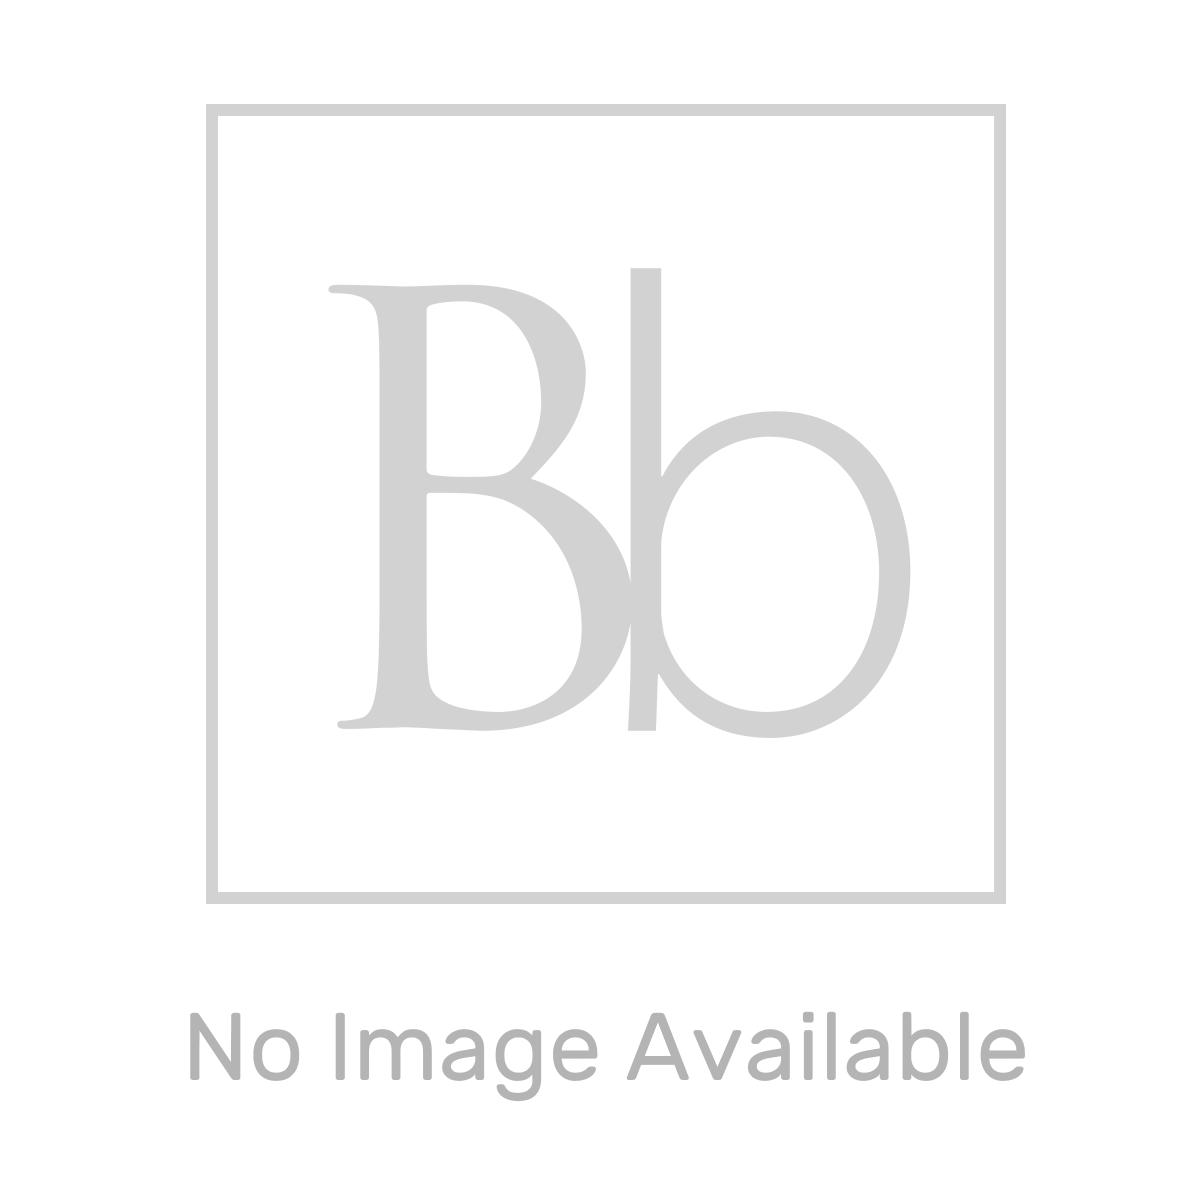 Aquadart Rolla 8 Black Sliding Shower Door with Optional Side Panel